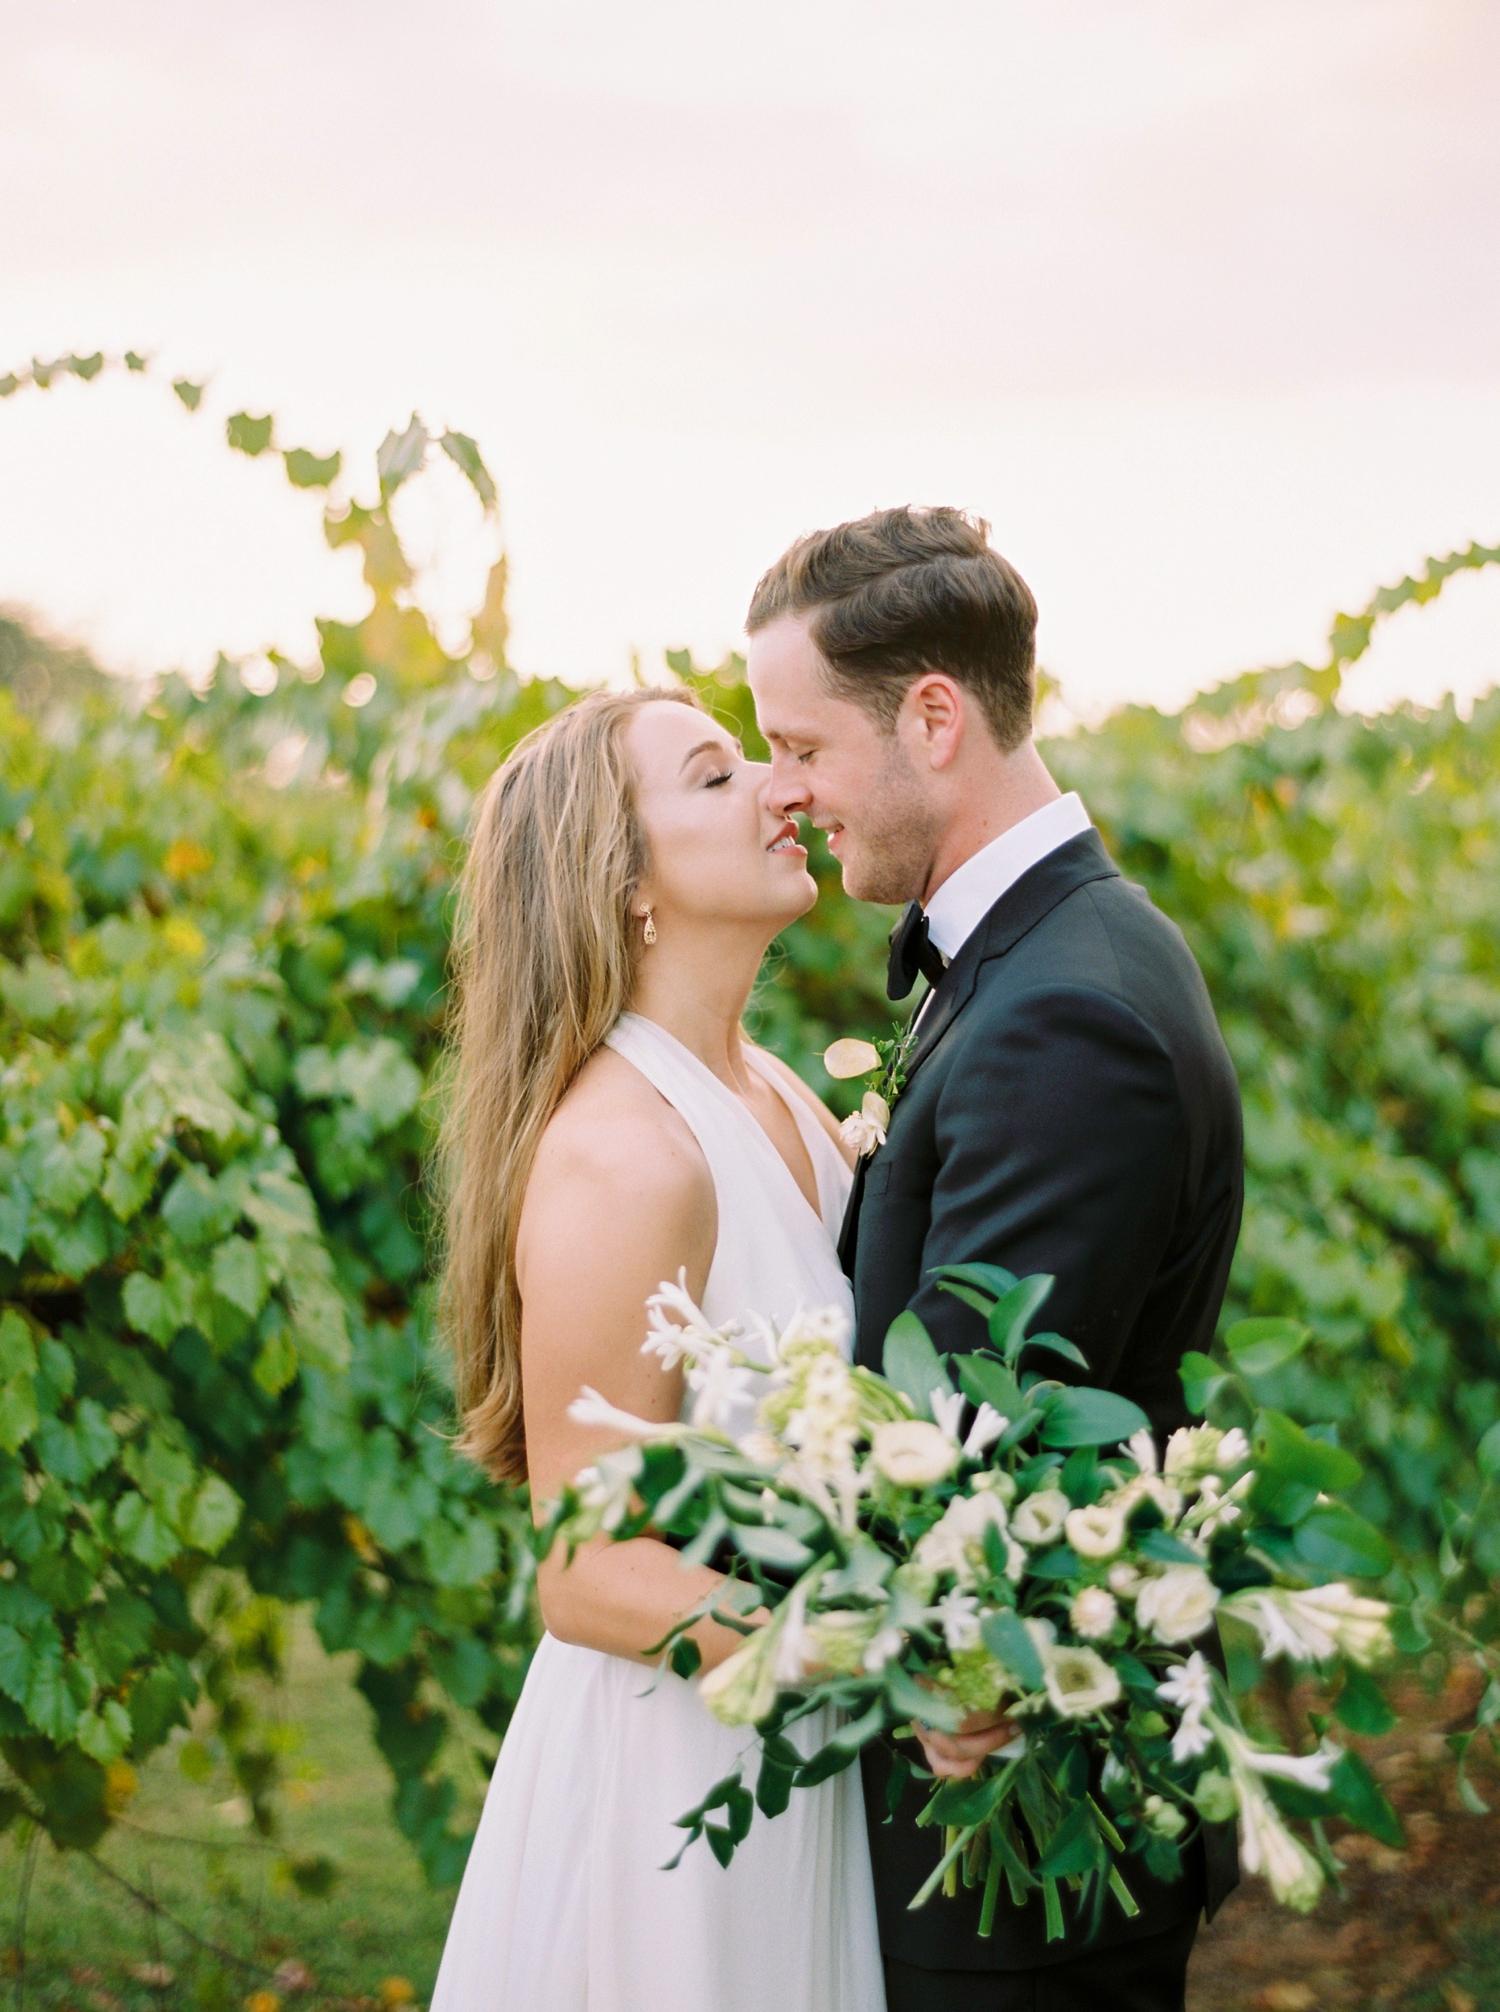 Calgary wedding photographers | georgia wedding photographers | fine art film | Justine Milton Photography | georgia wedding | bride and groom portraits | bouquet | pastel wedding inspiration